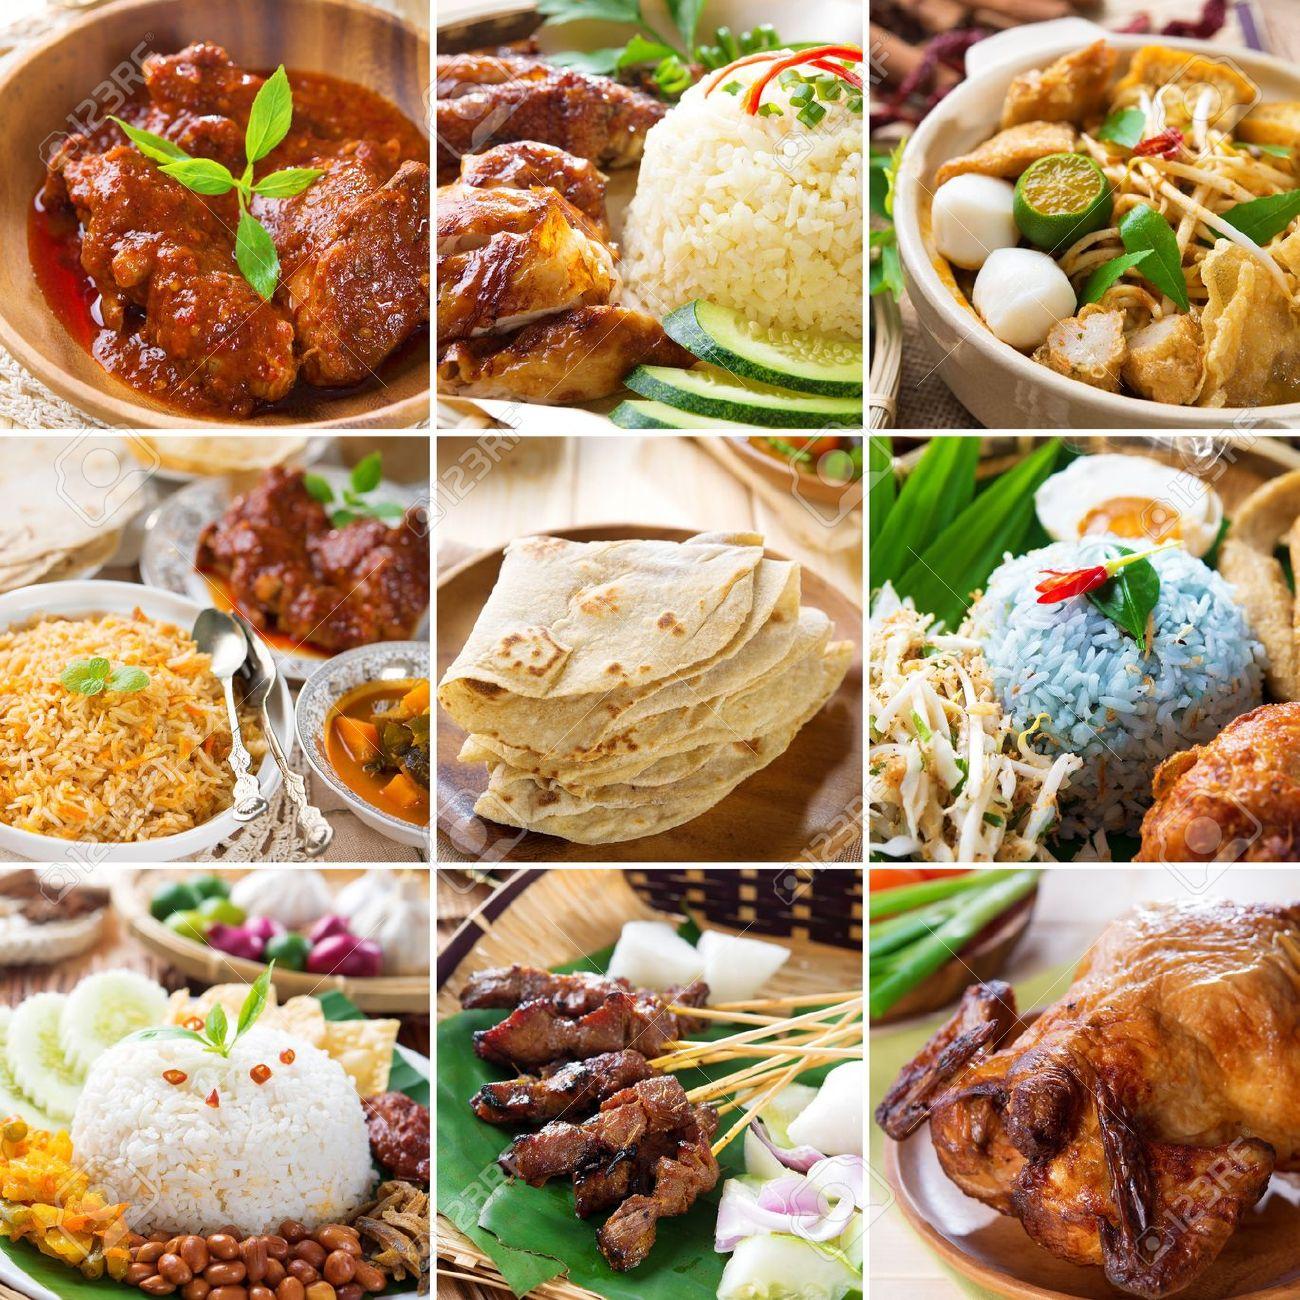 asian food collection. verschiedene asia küche, curry, reis